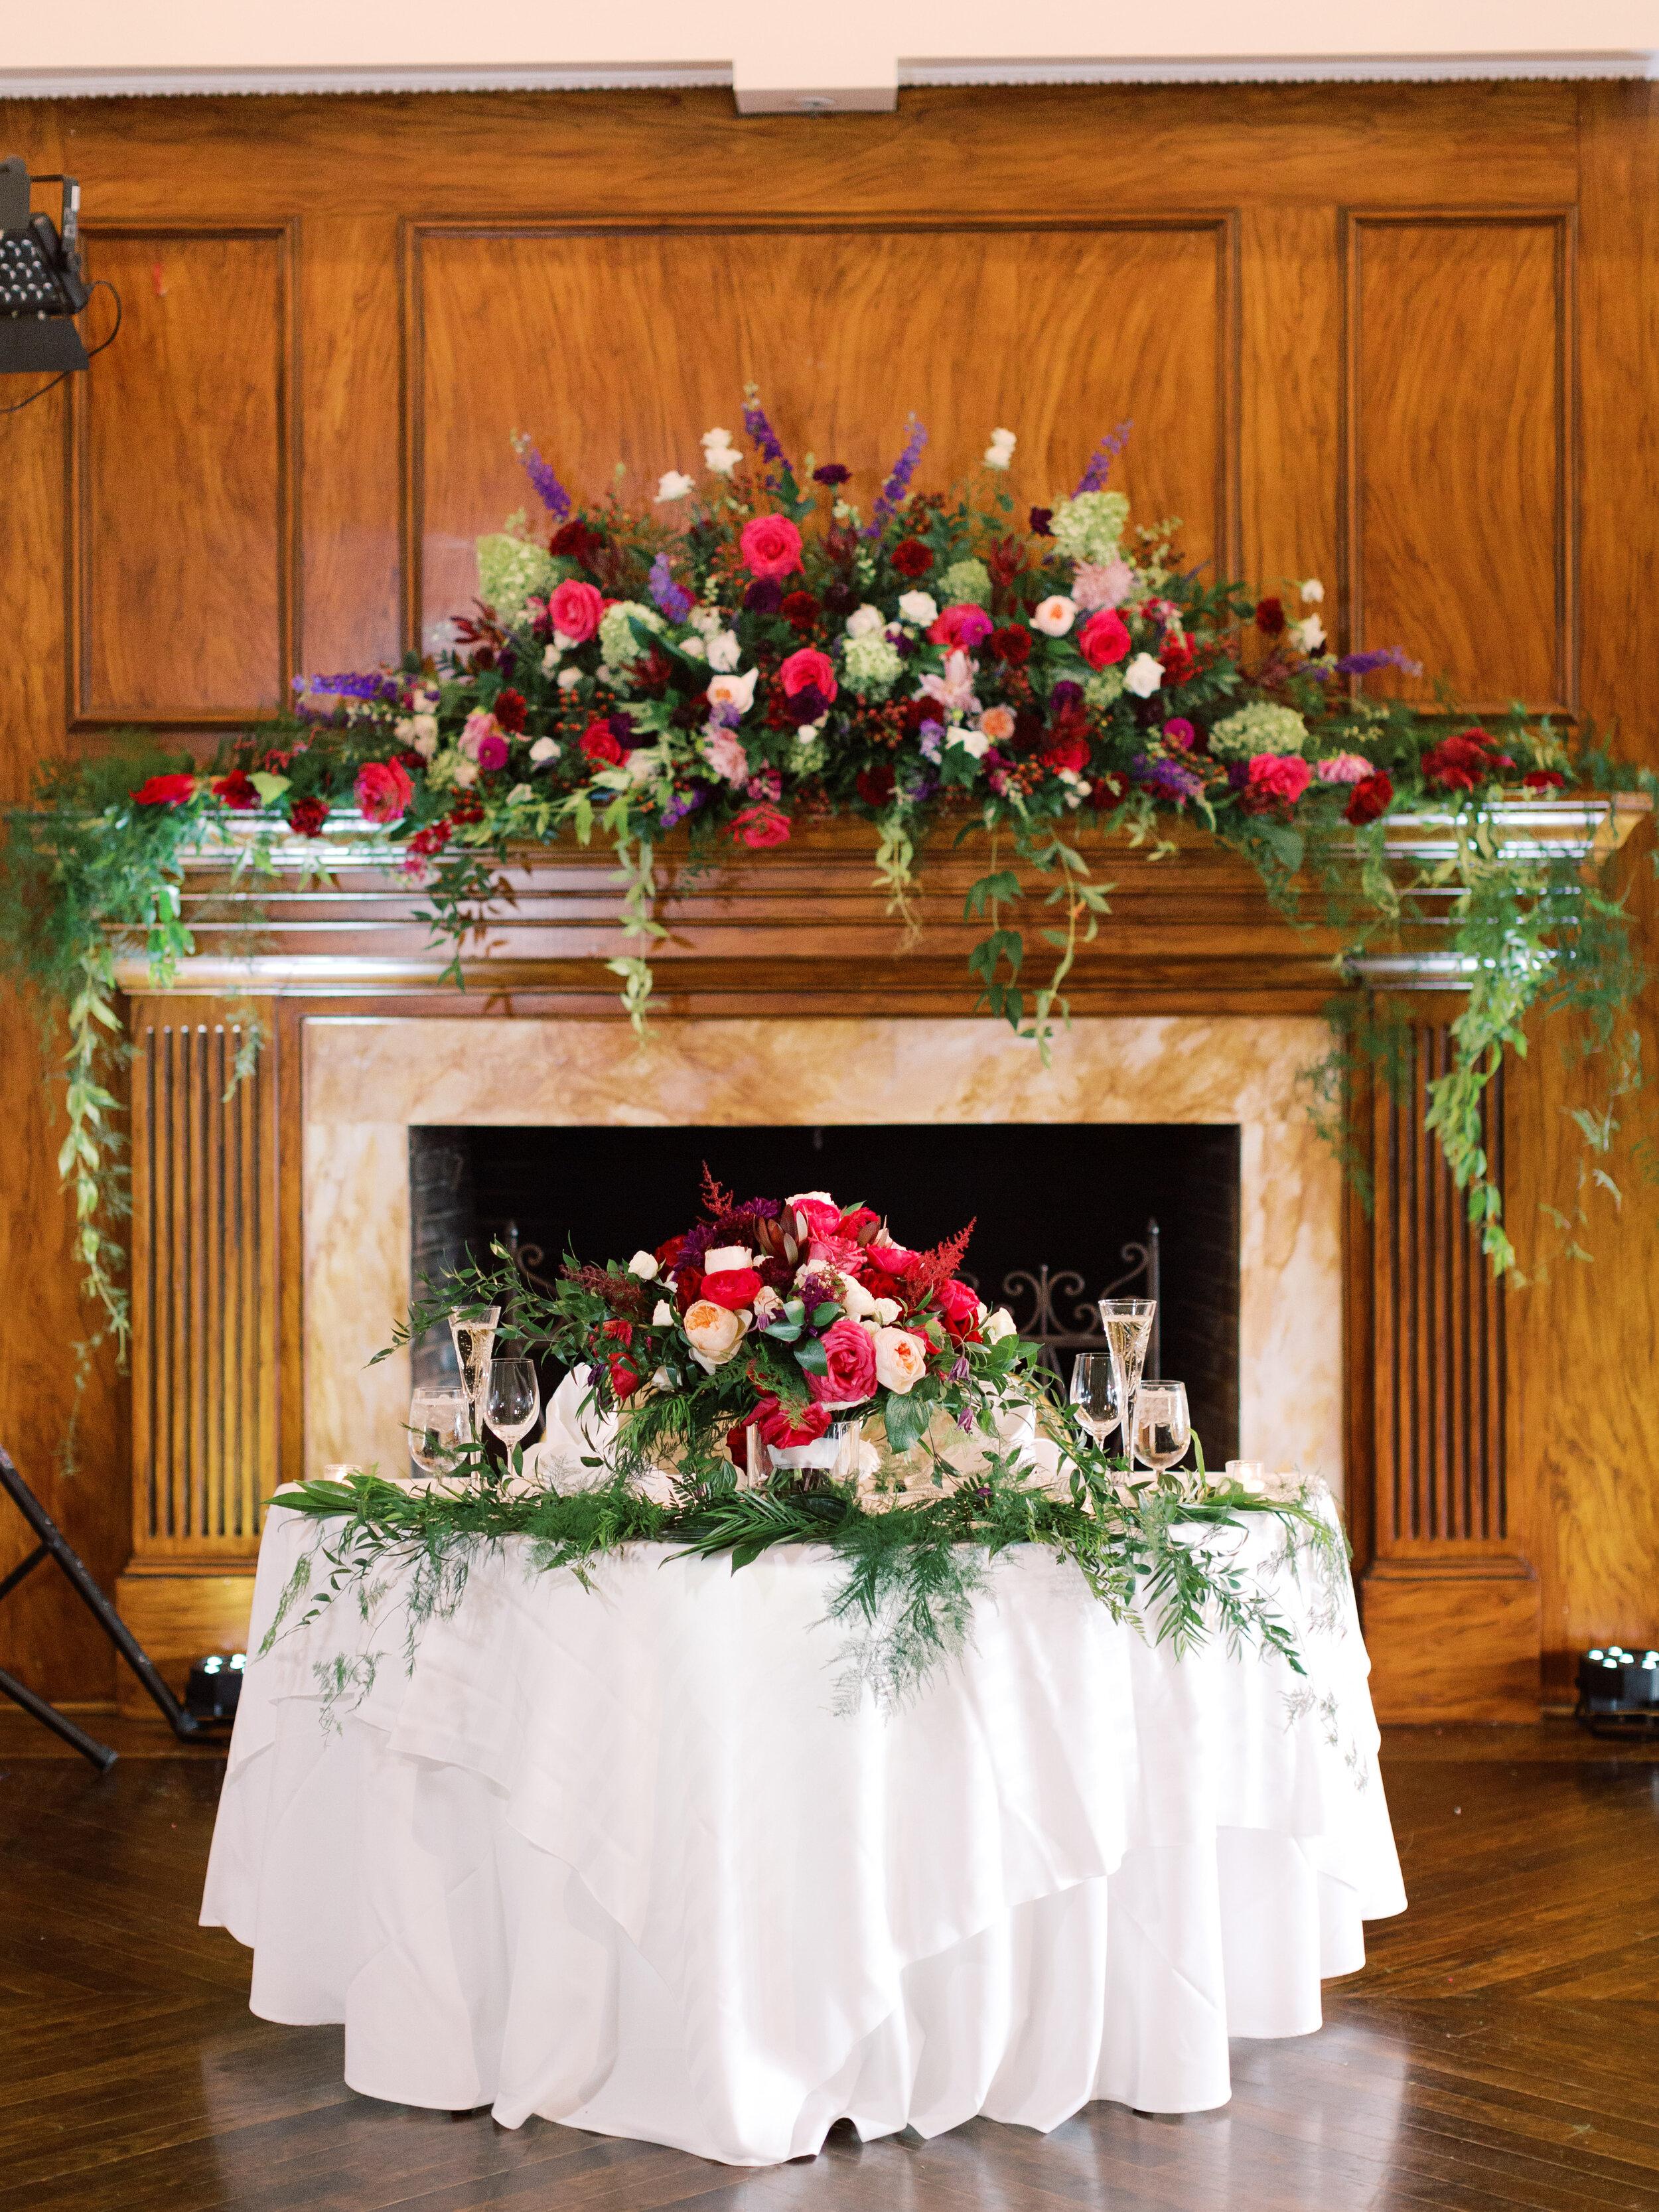 Repurposing Ceremony Flowers for Receptions